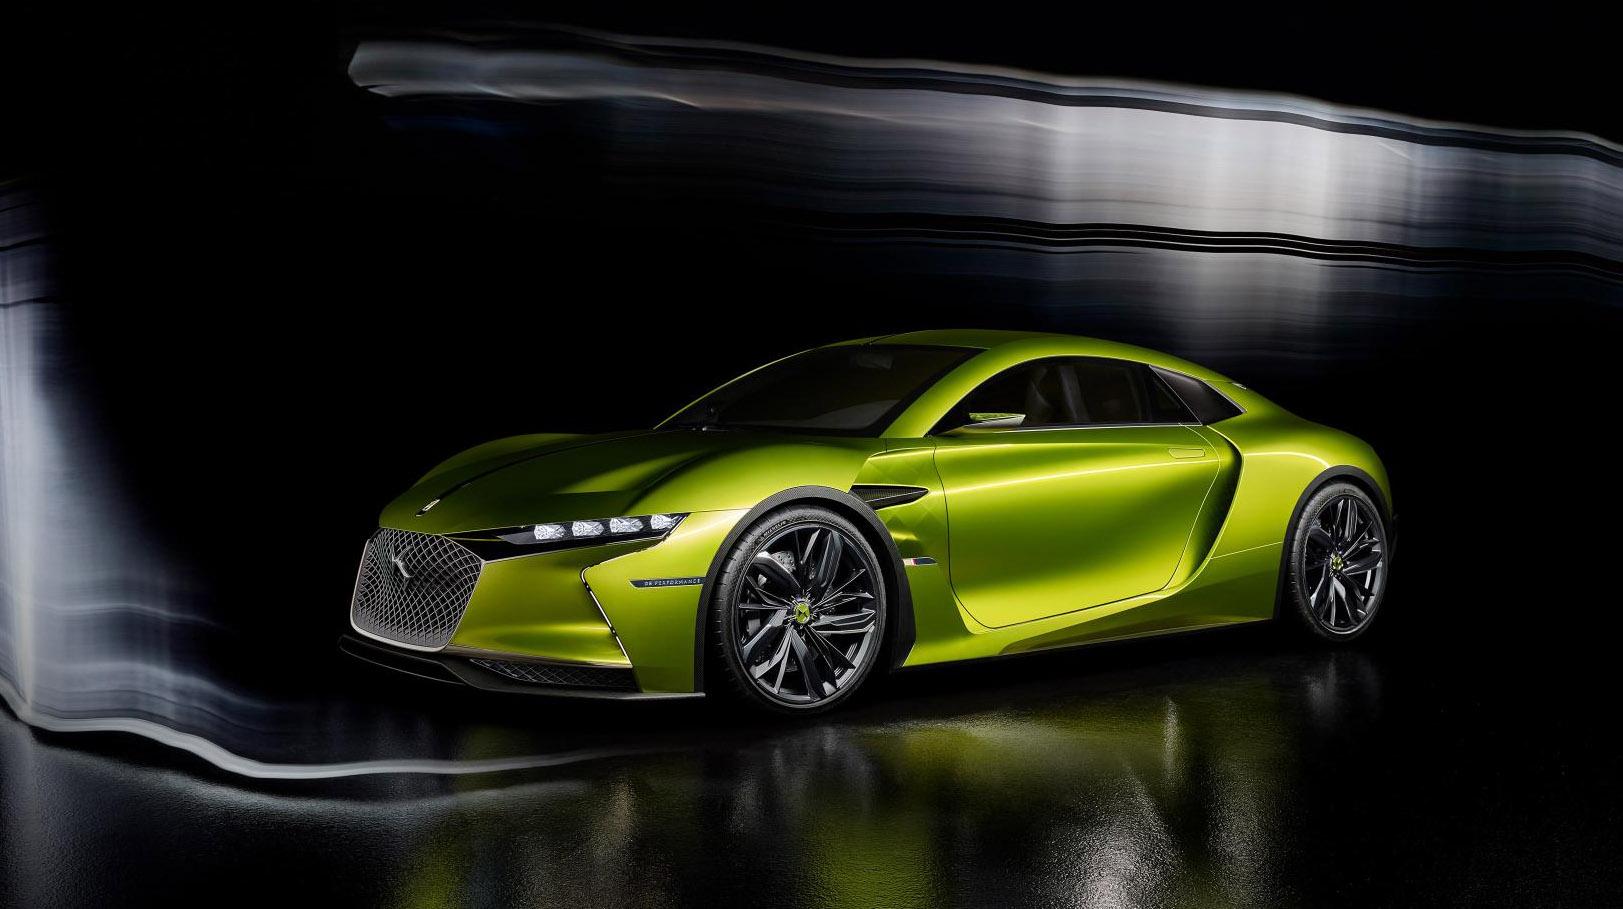 Acura Vs Lexus >> Citroen's DS plans a 600 hp BMW i8 competitor